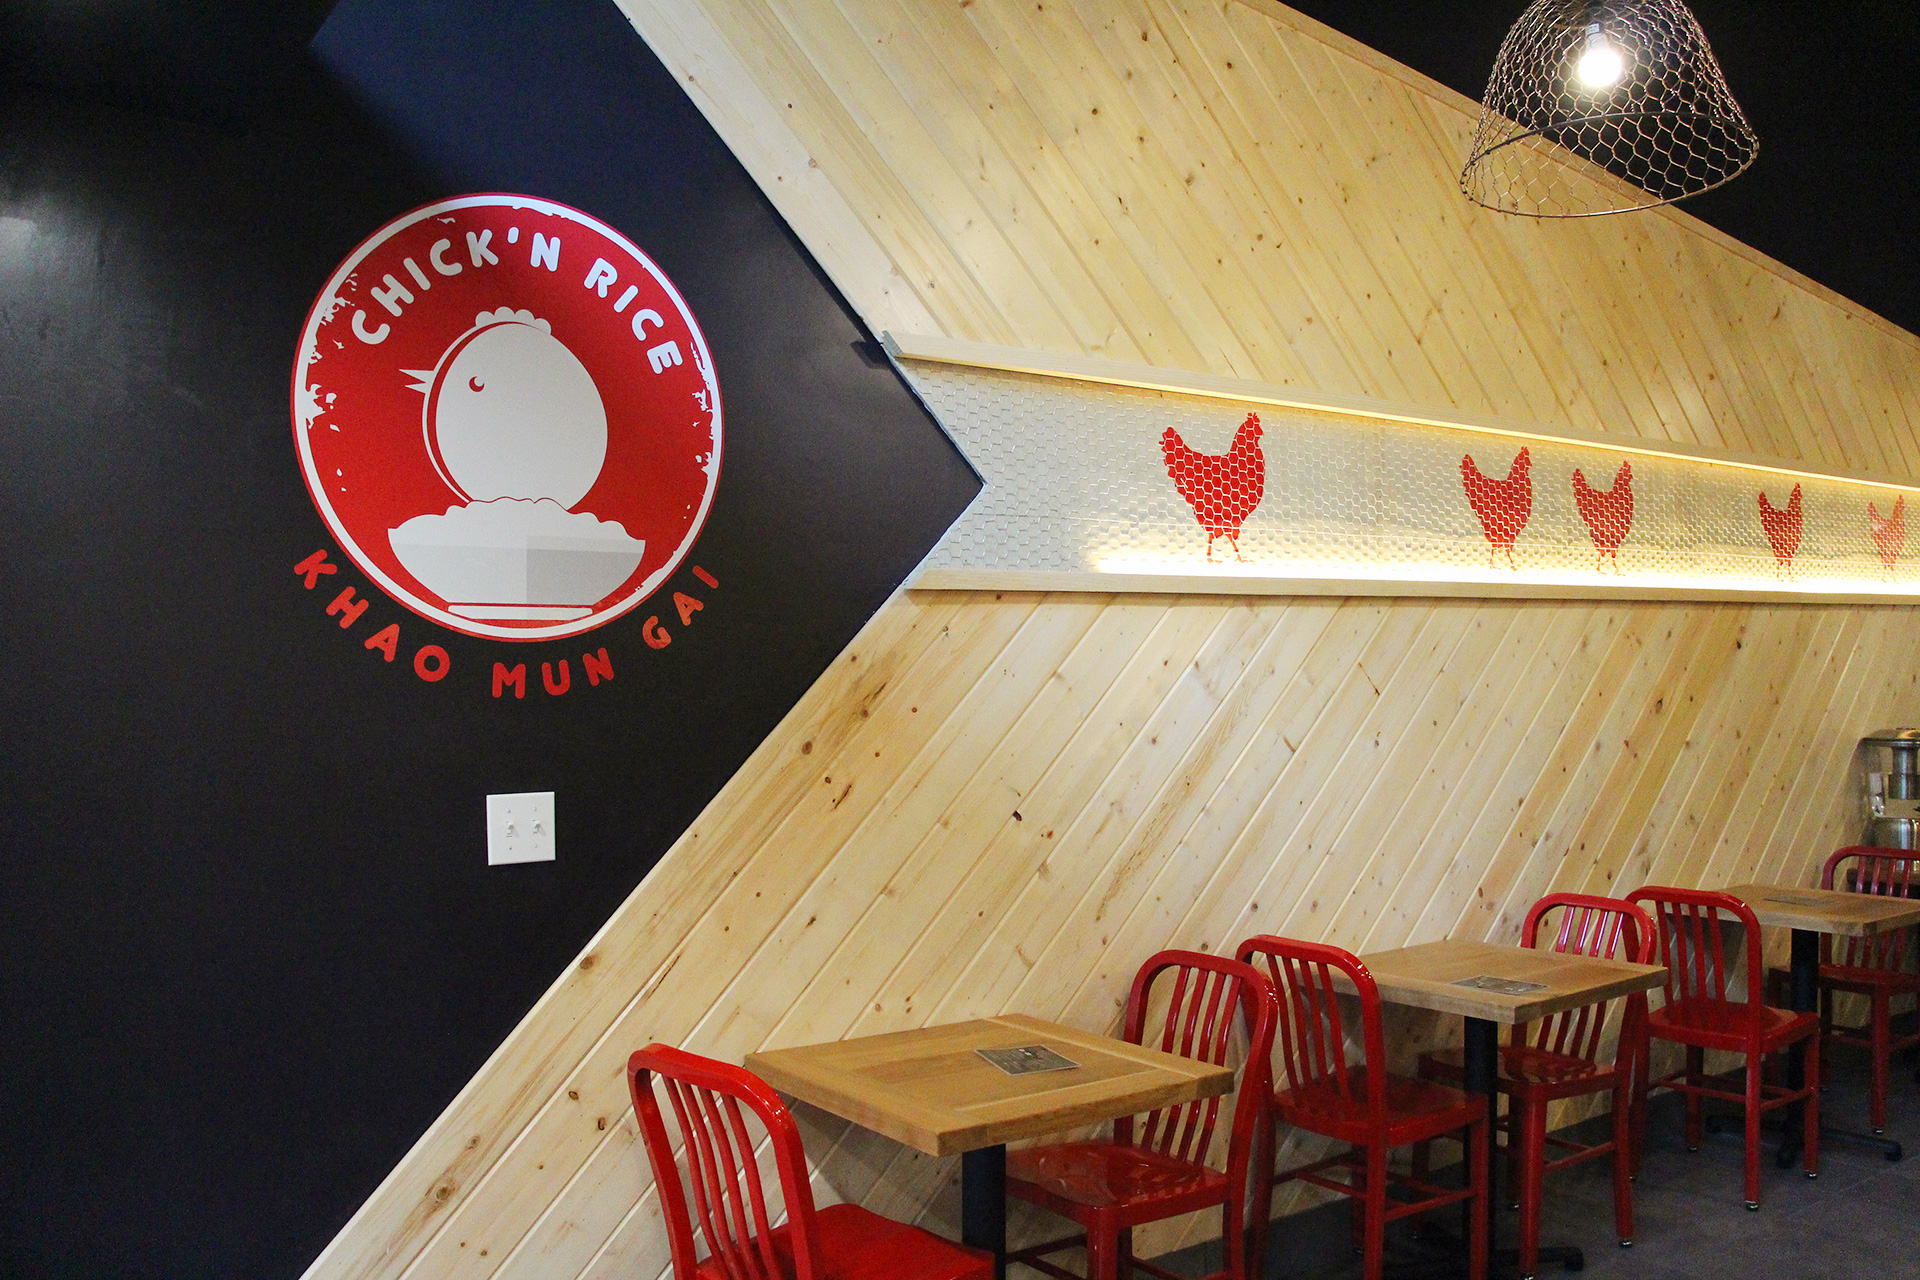 Chick'n Rice interior